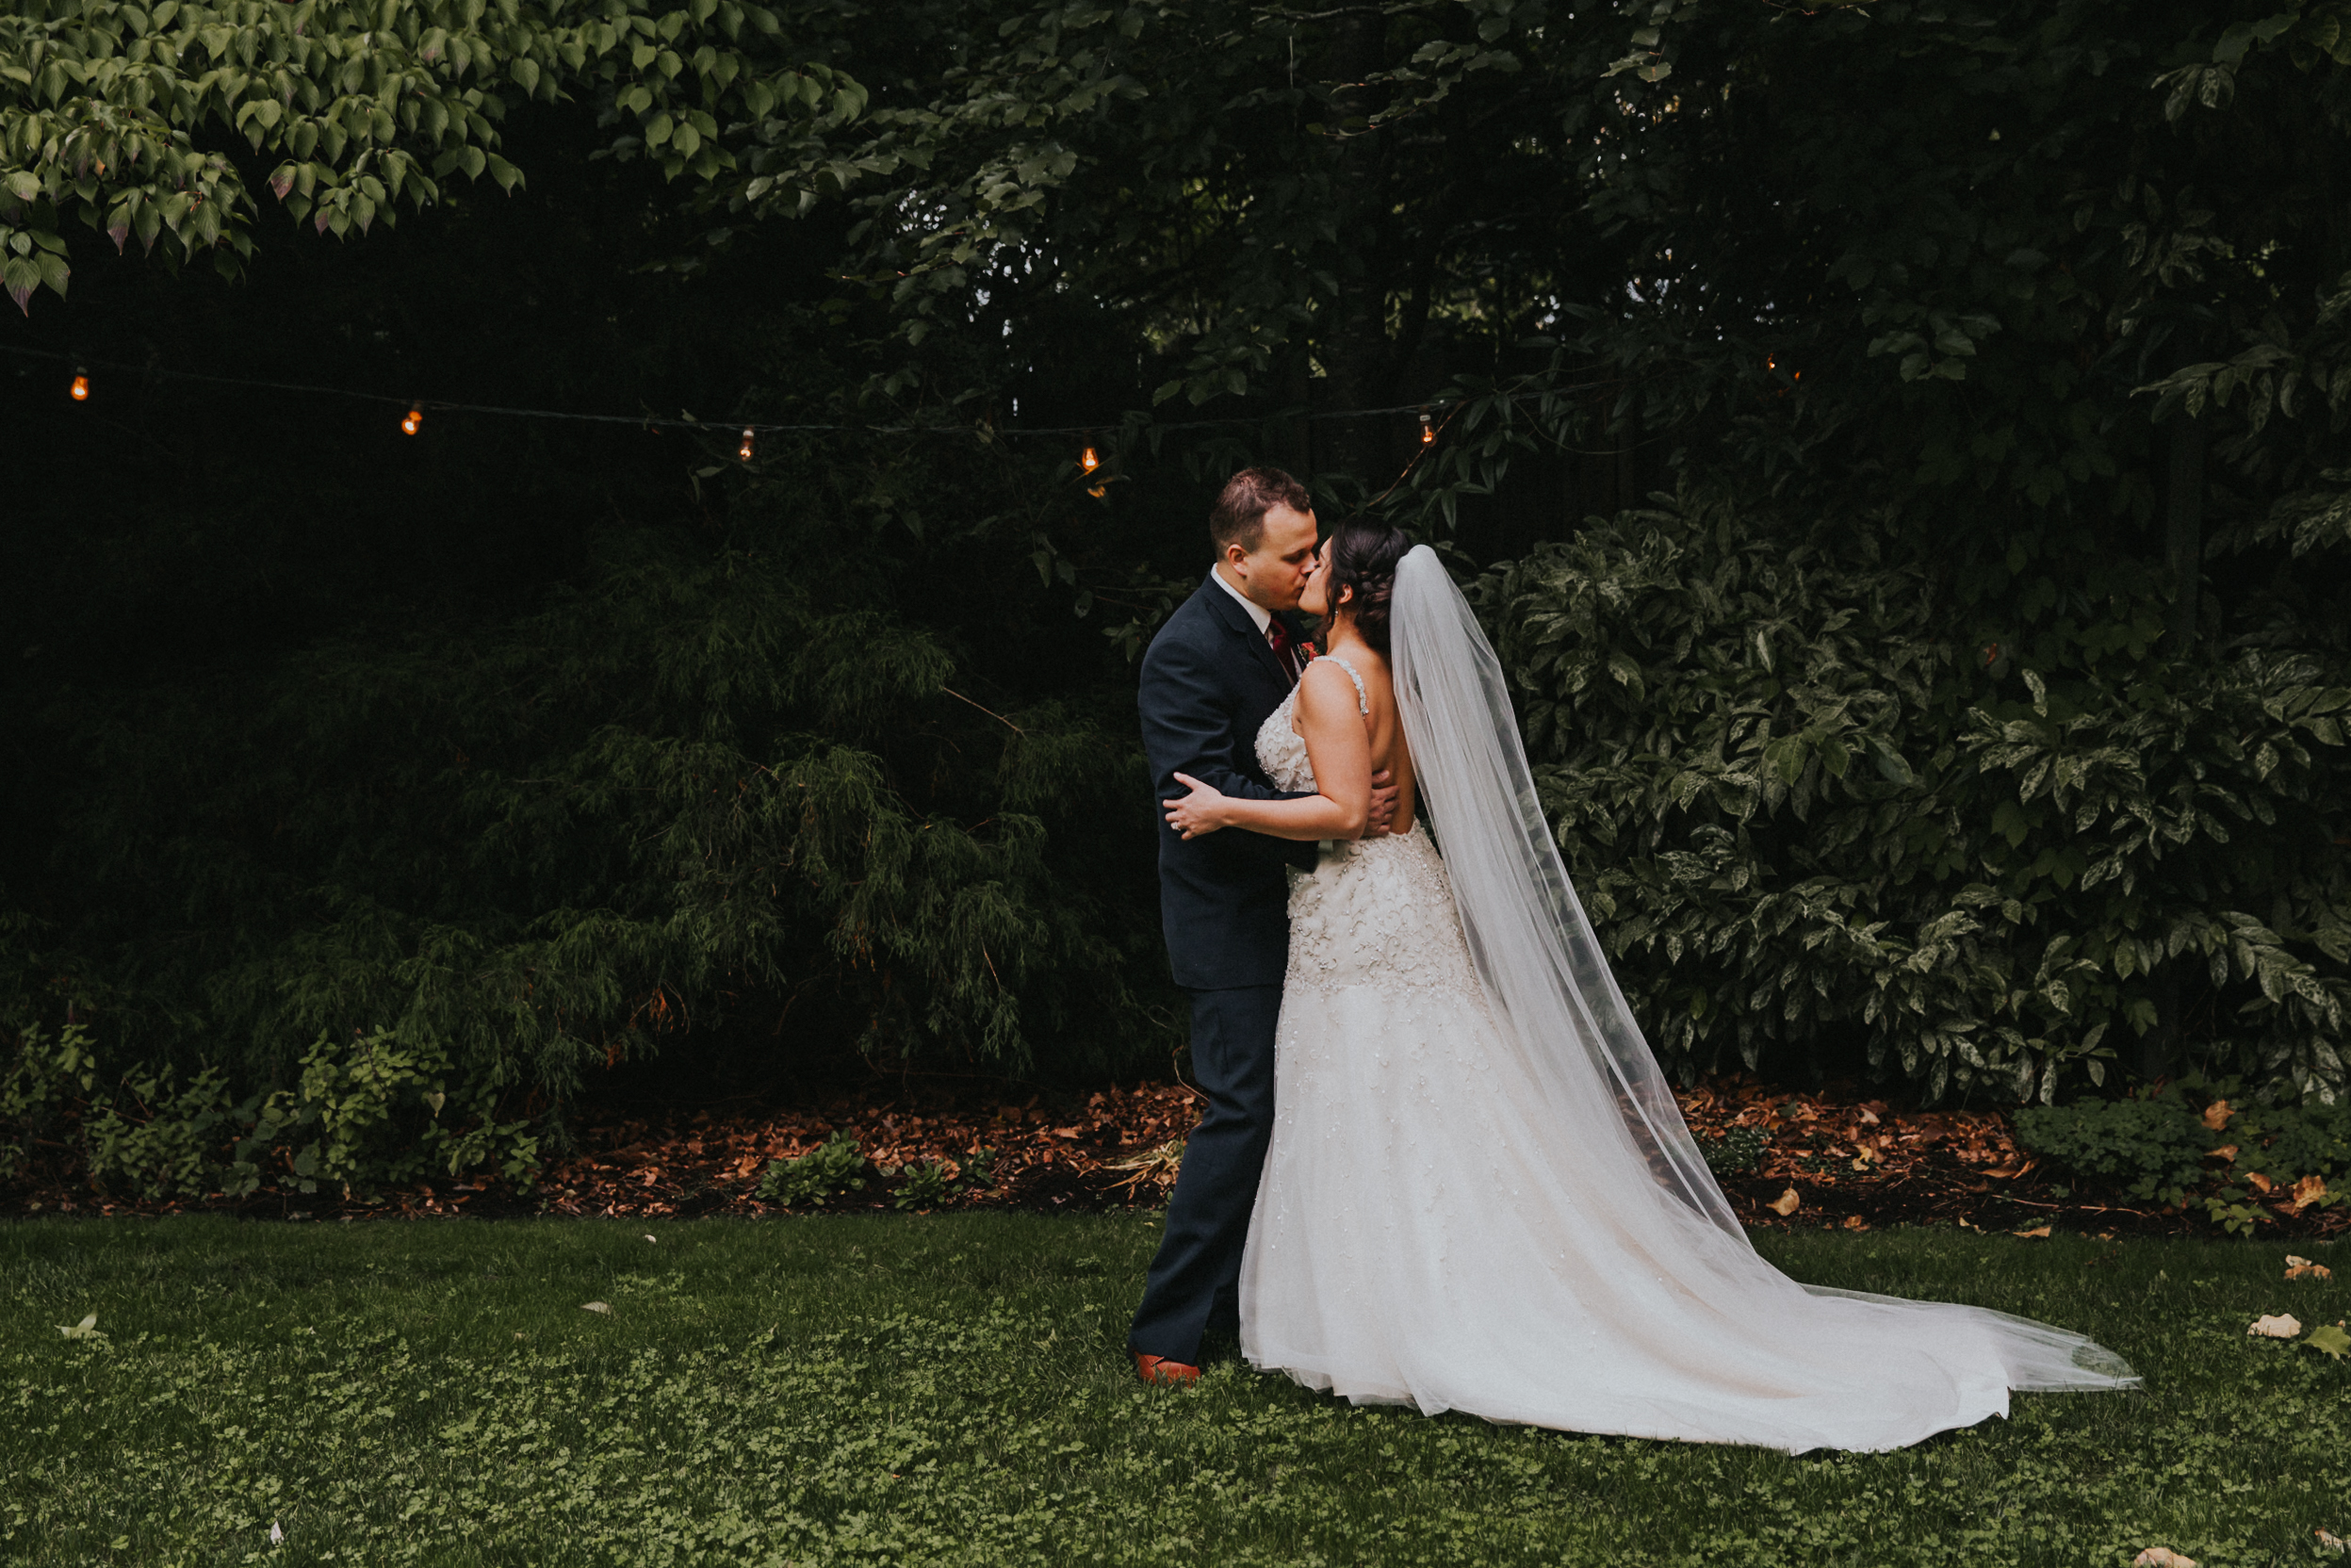 Portland_wedding_photographer_McMenamins_Alfred_Tang-6.jpg